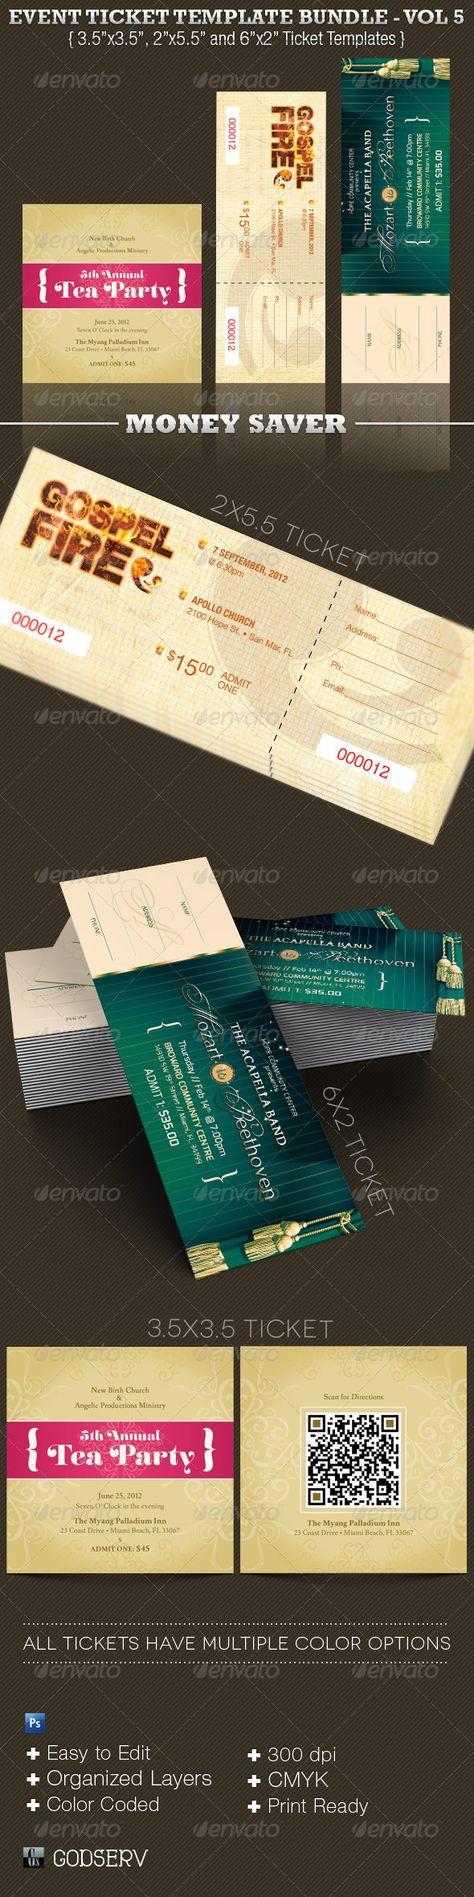 Event Ticket Template Bundle Vol 5